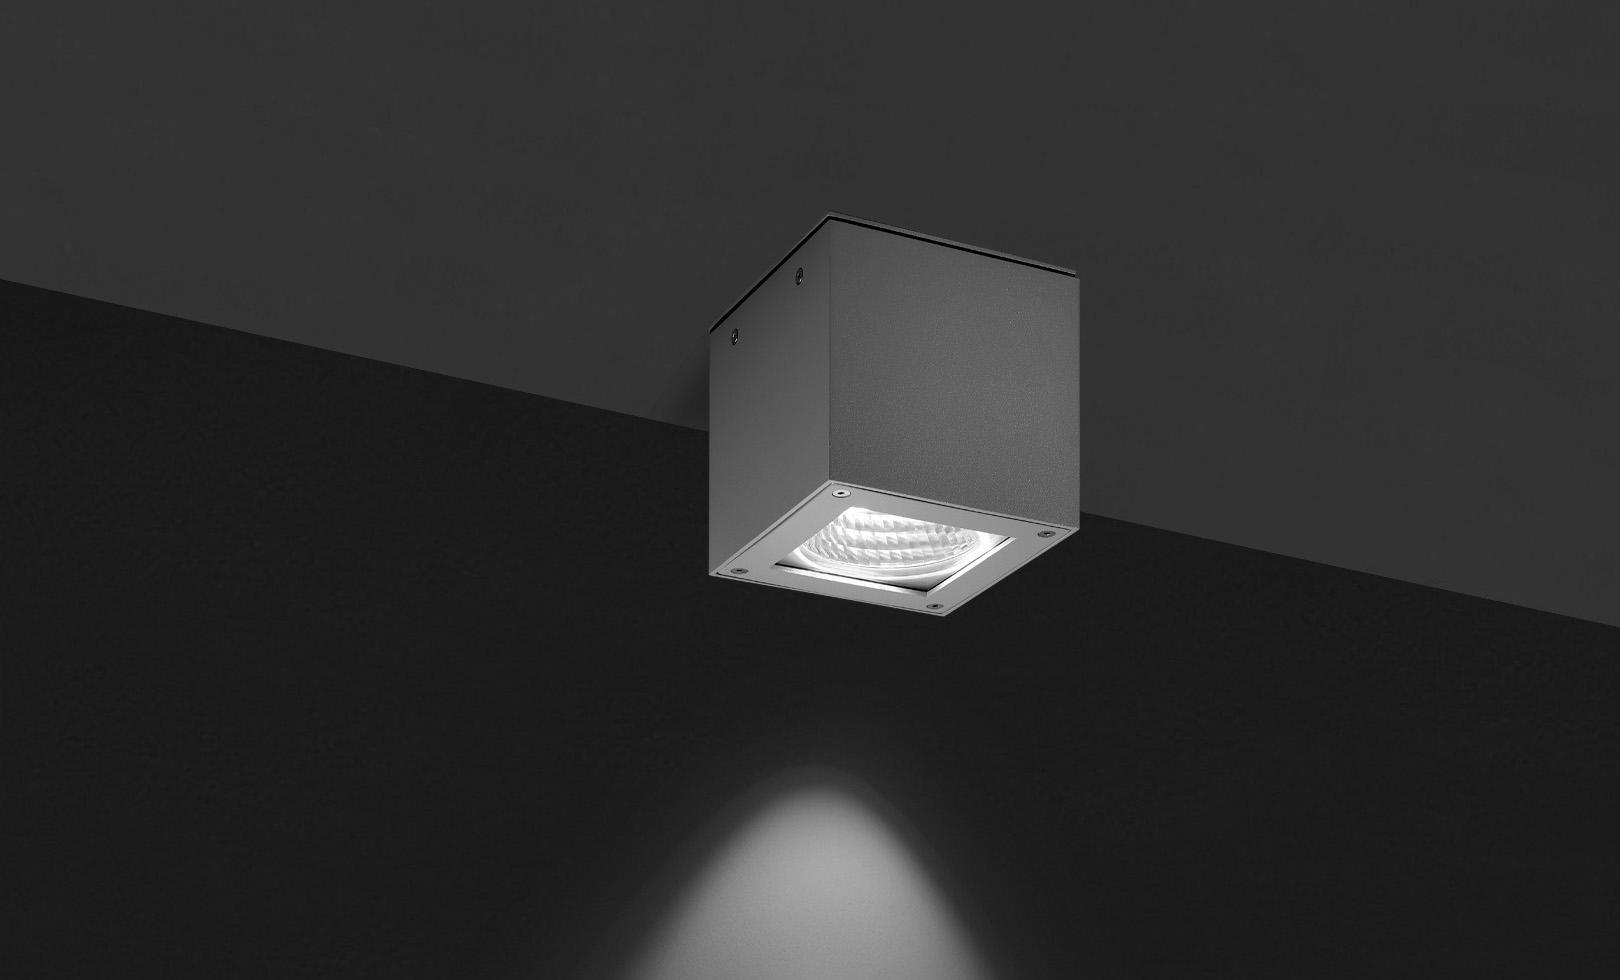 706011 TECH MEDIUM COMPACT 03 SQUARE LED 20W 1